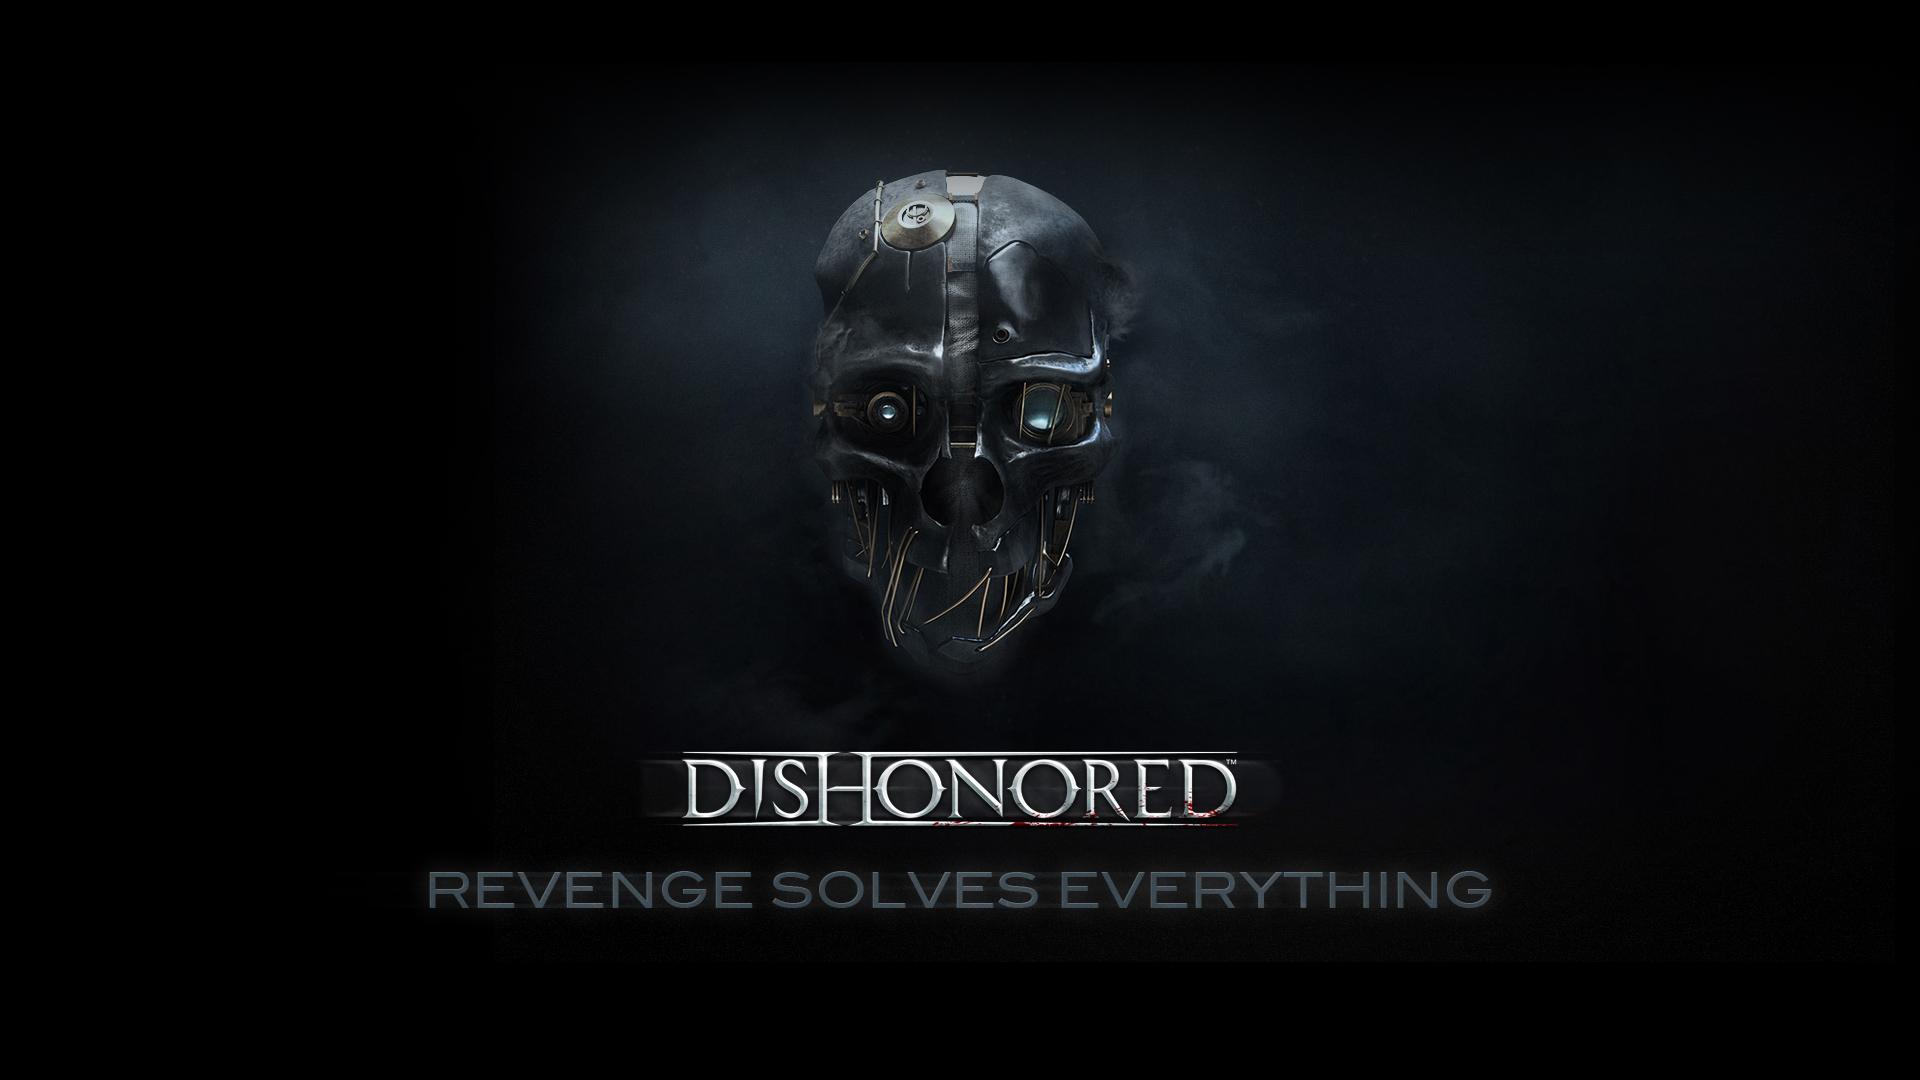 dishonored computer wallpapers desktop backgrounds